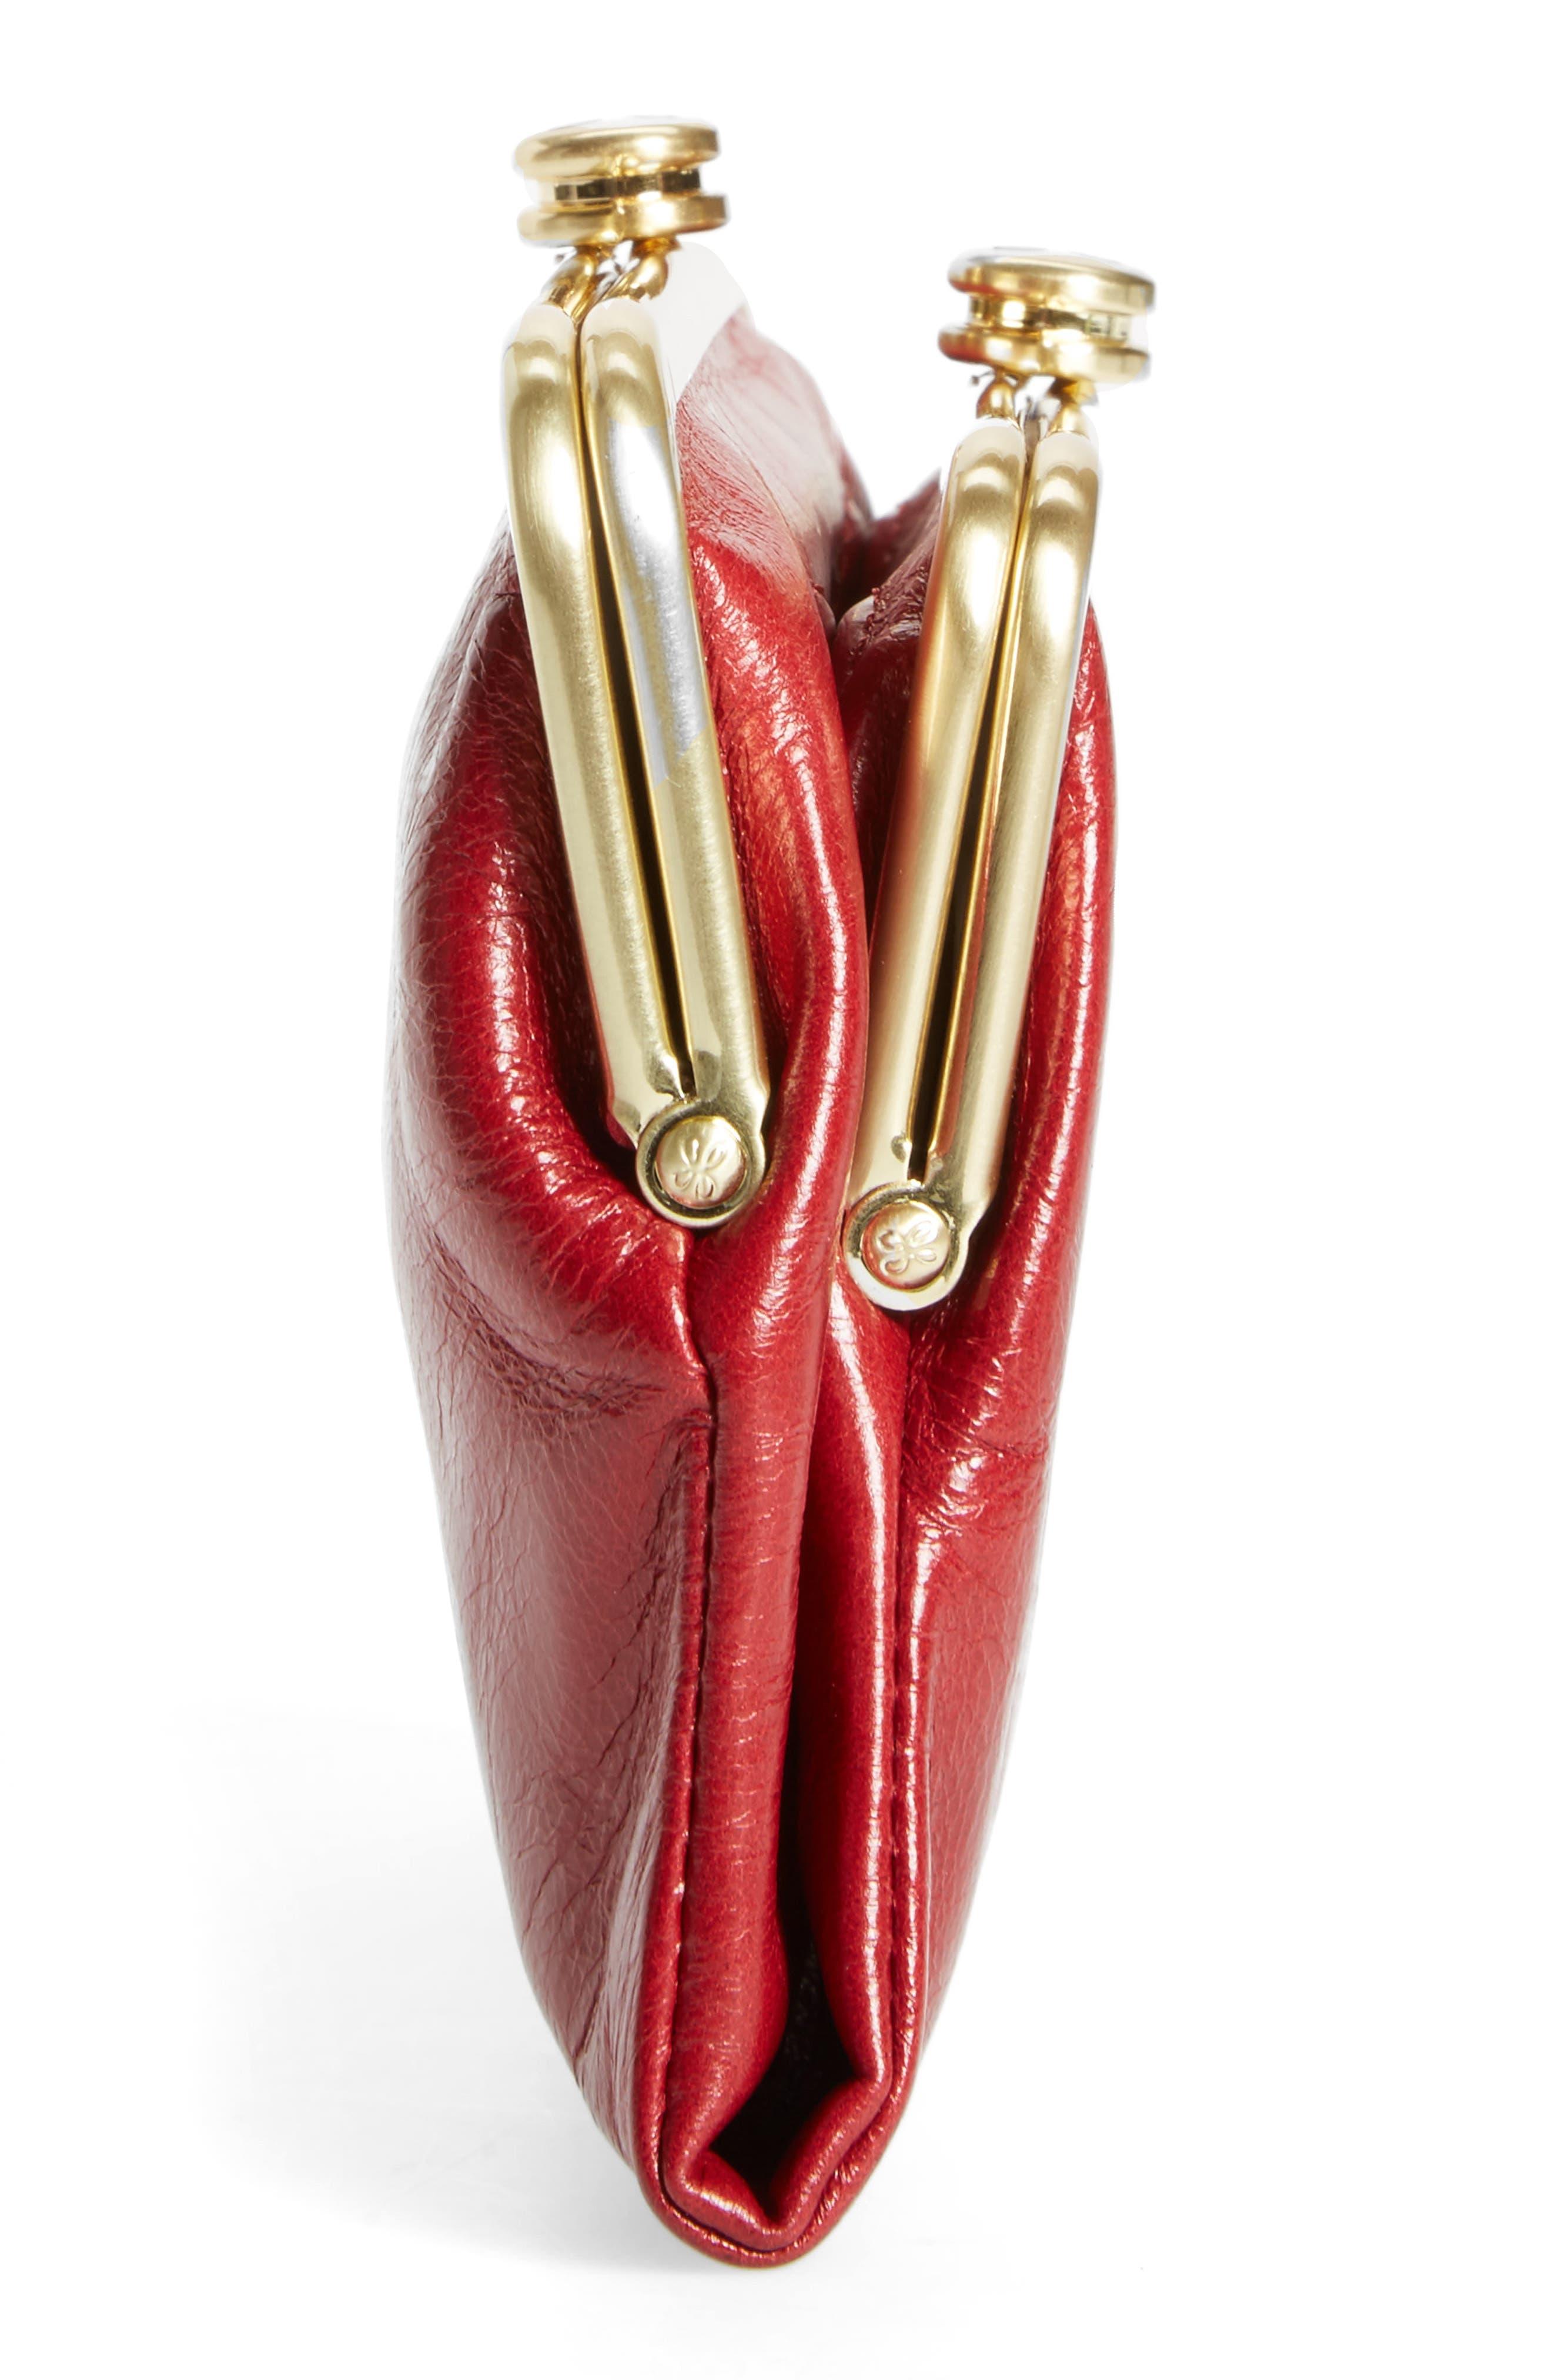 Suzette Calfskin Leather Wallet,                             Alternate thumbnail 4, color,                             Cardinal